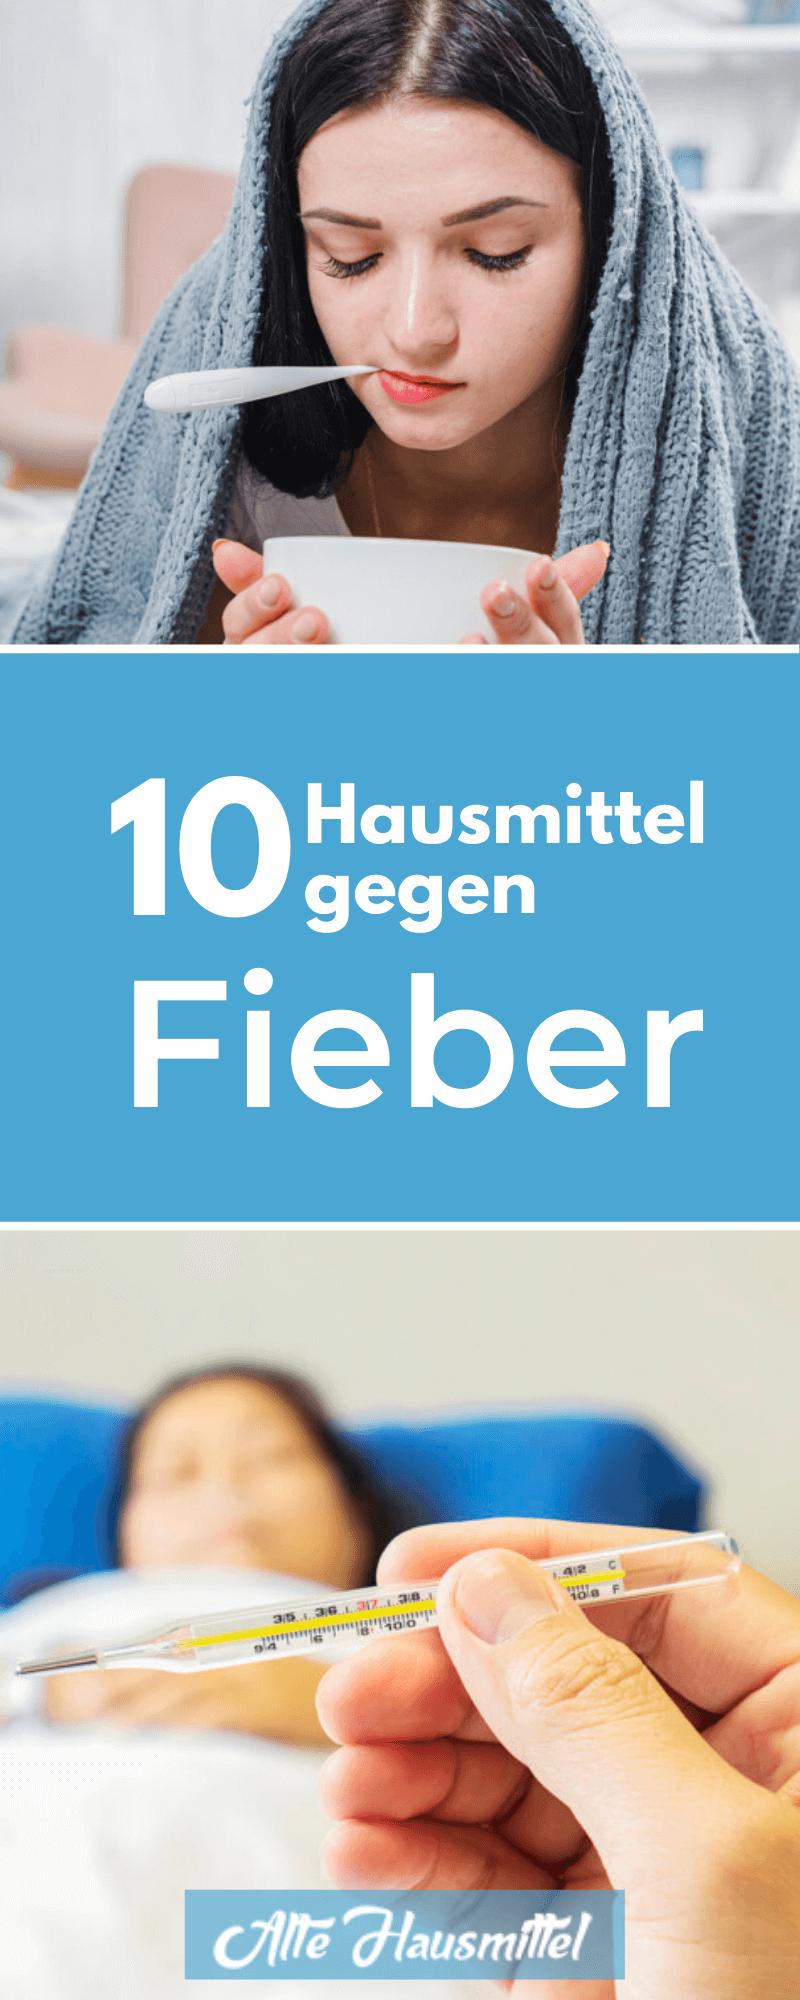 10 Hausmittel gegen Fieber